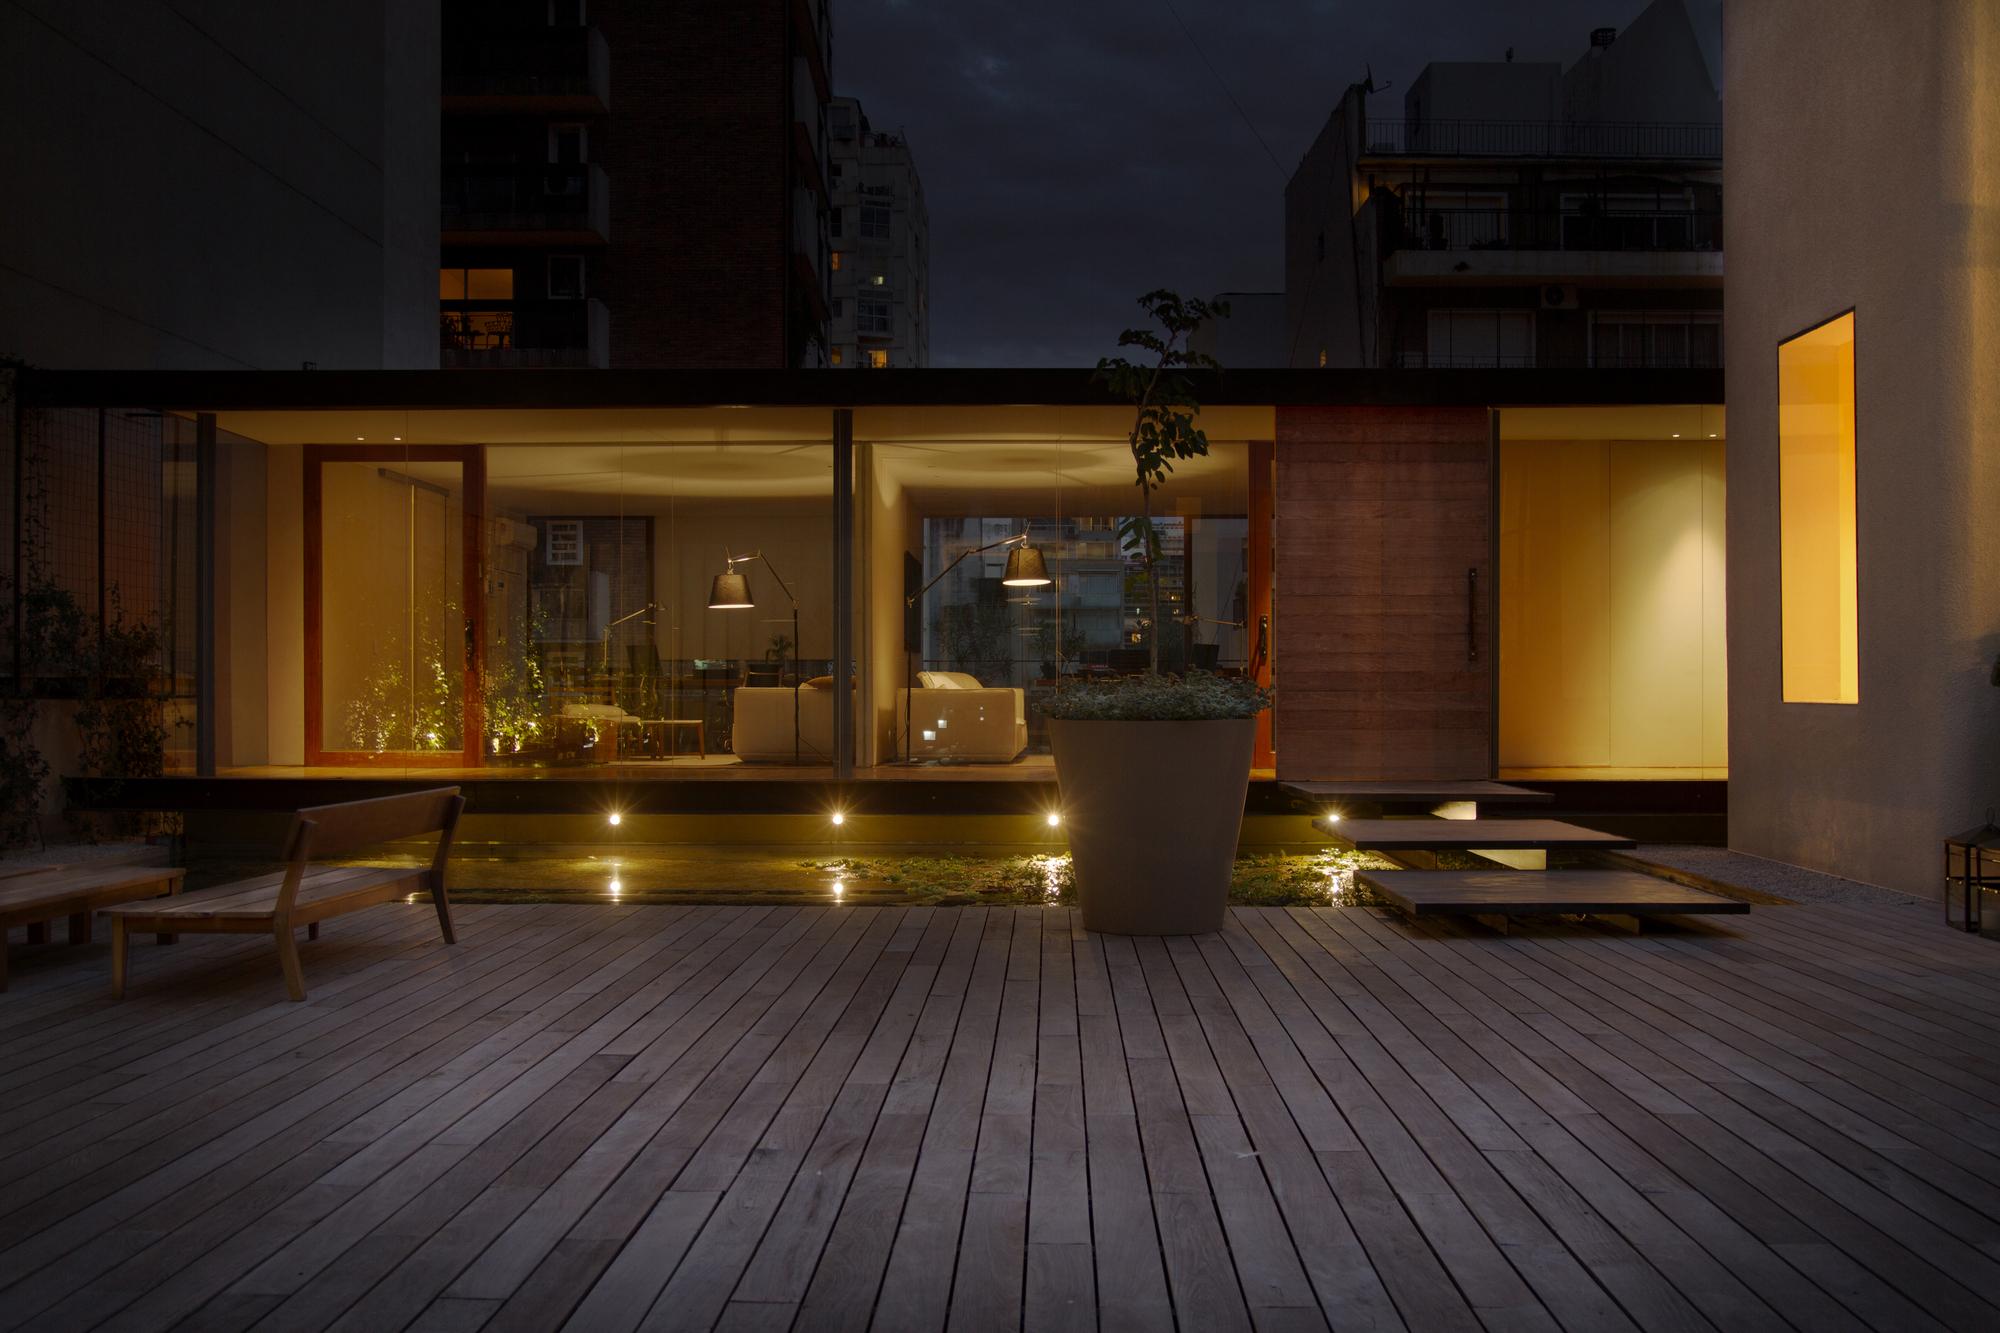 521cbb50e8e44effd4000068_textiles-del-sur-offices-ana-smud_exterior_volumen_noche_.jpg